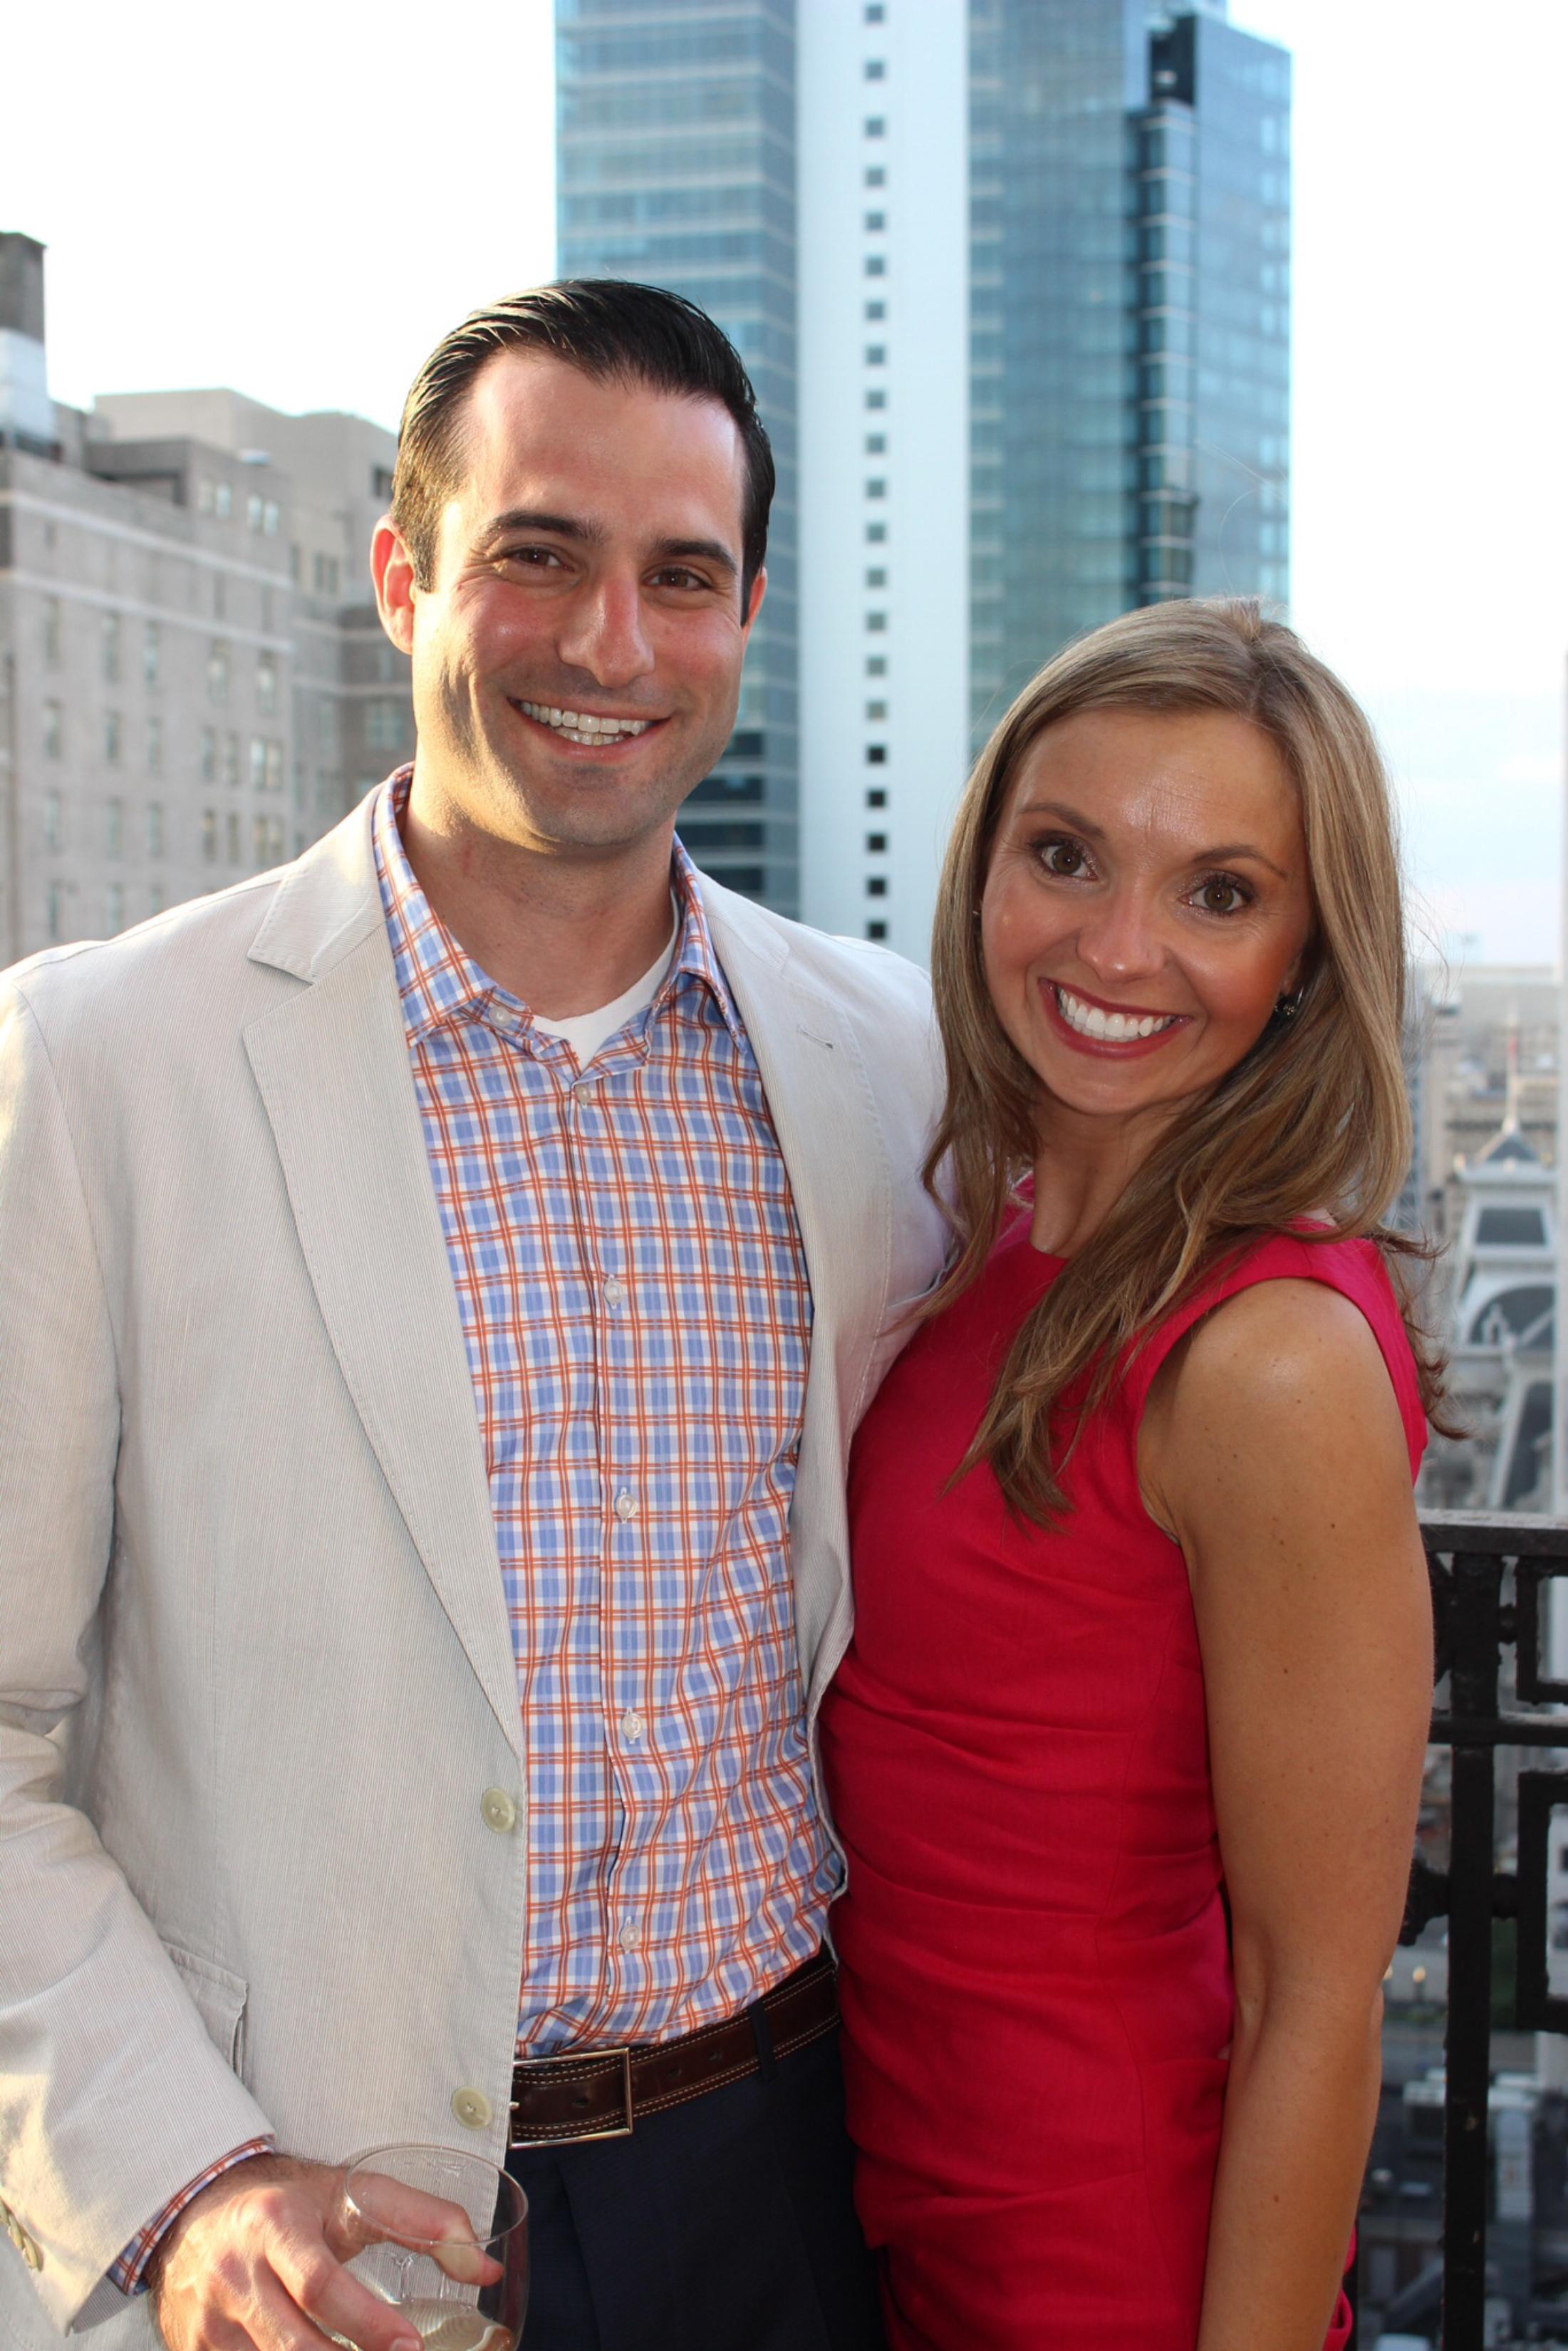 Scott & Lucinda Friedman Fund